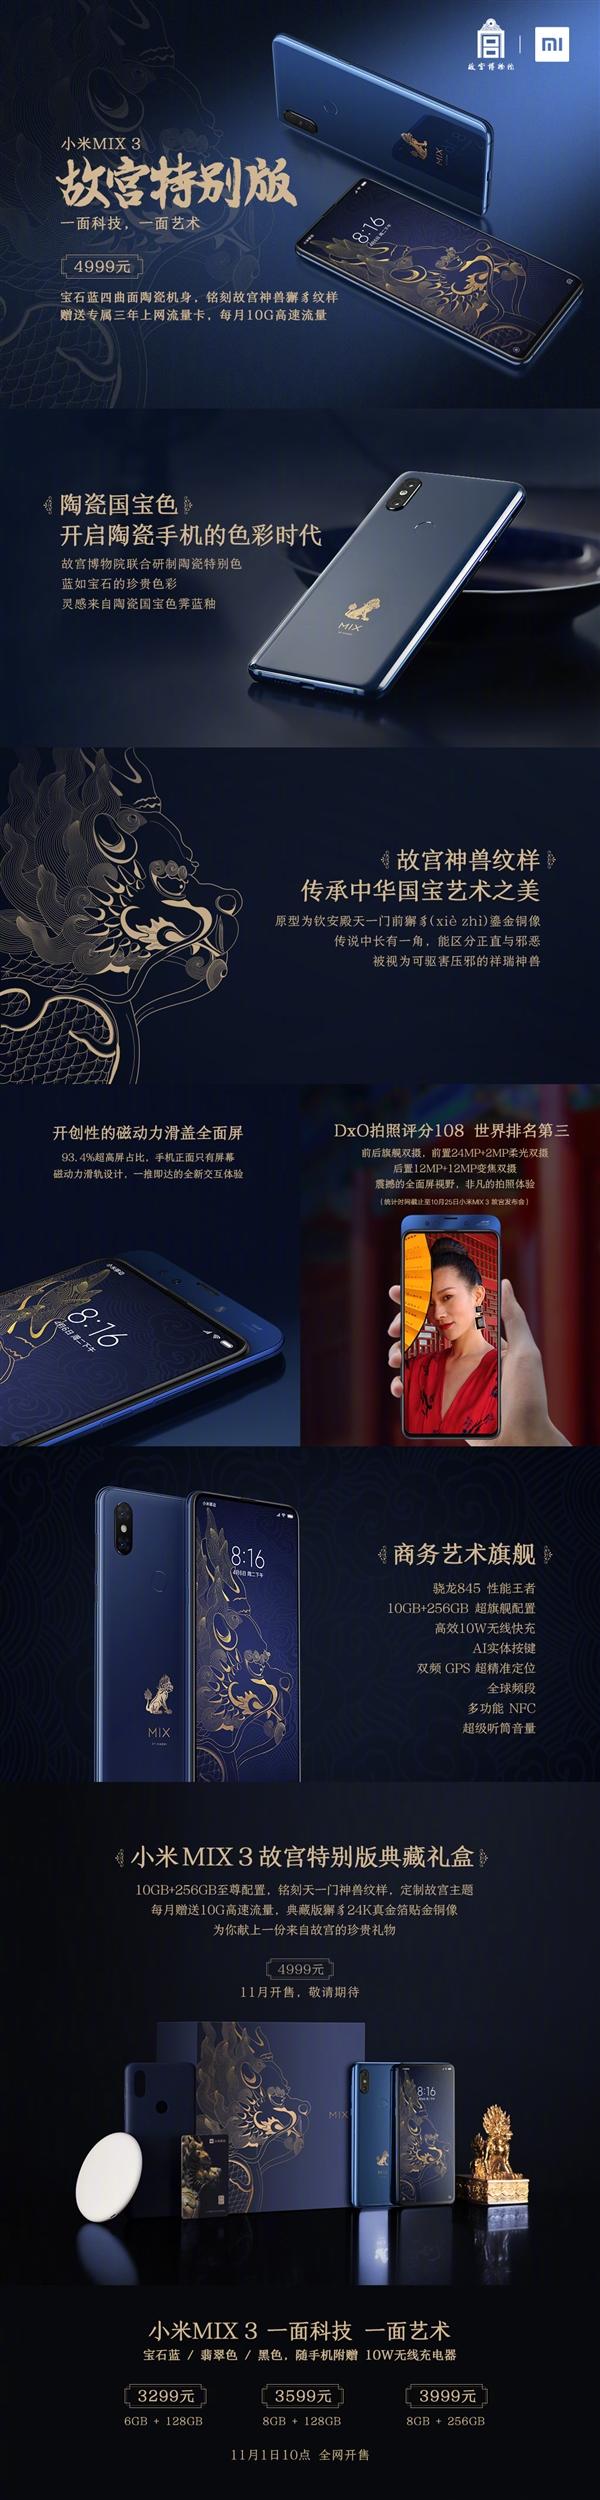 Mi Mix 3 Forbidden City edition